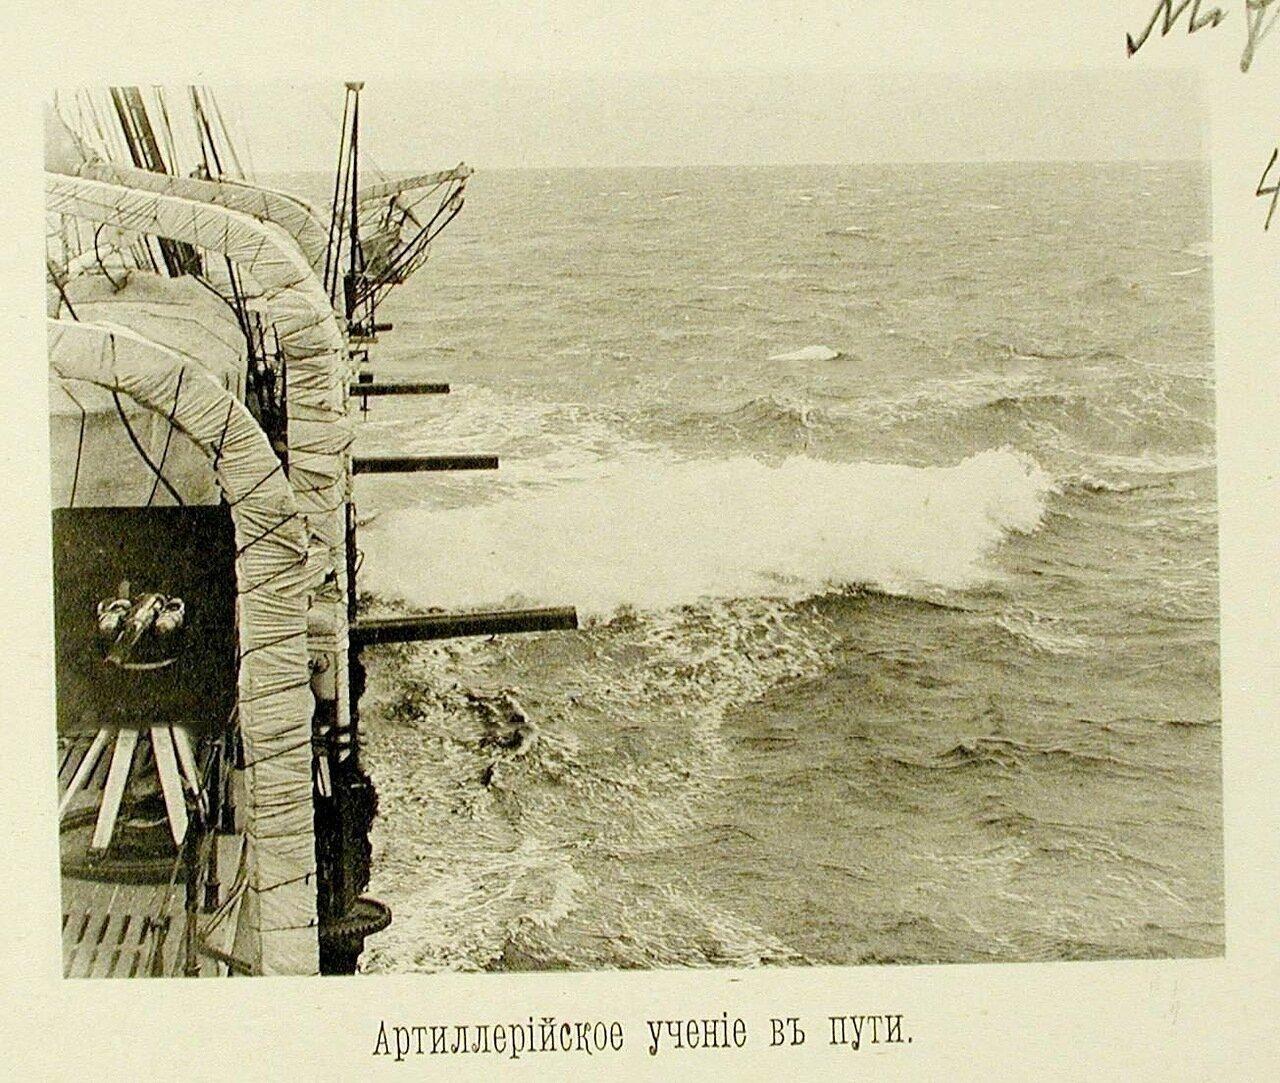 04.  Пушки на борту крейсера Адмирал Корнилов во время артиллерийских учений на пути в Чифу. 20-26 апреля 1895